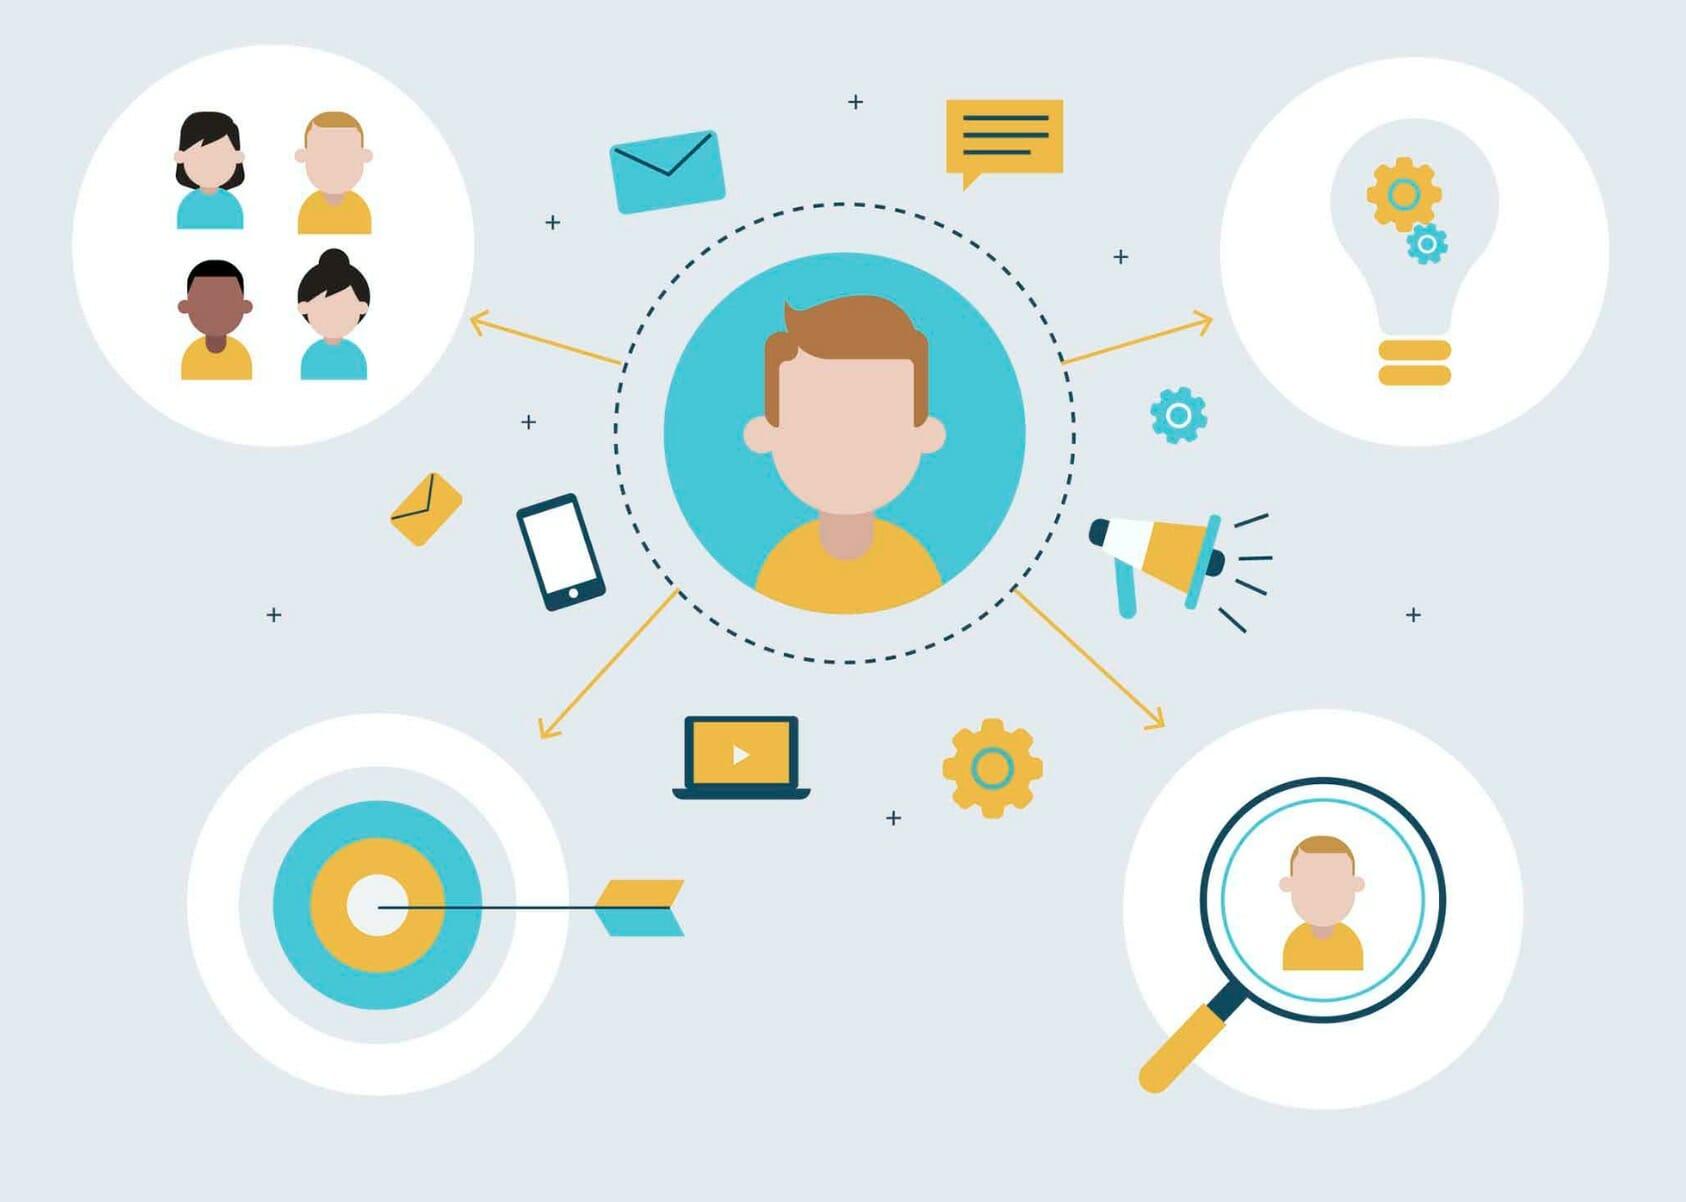 influencer process on illustration